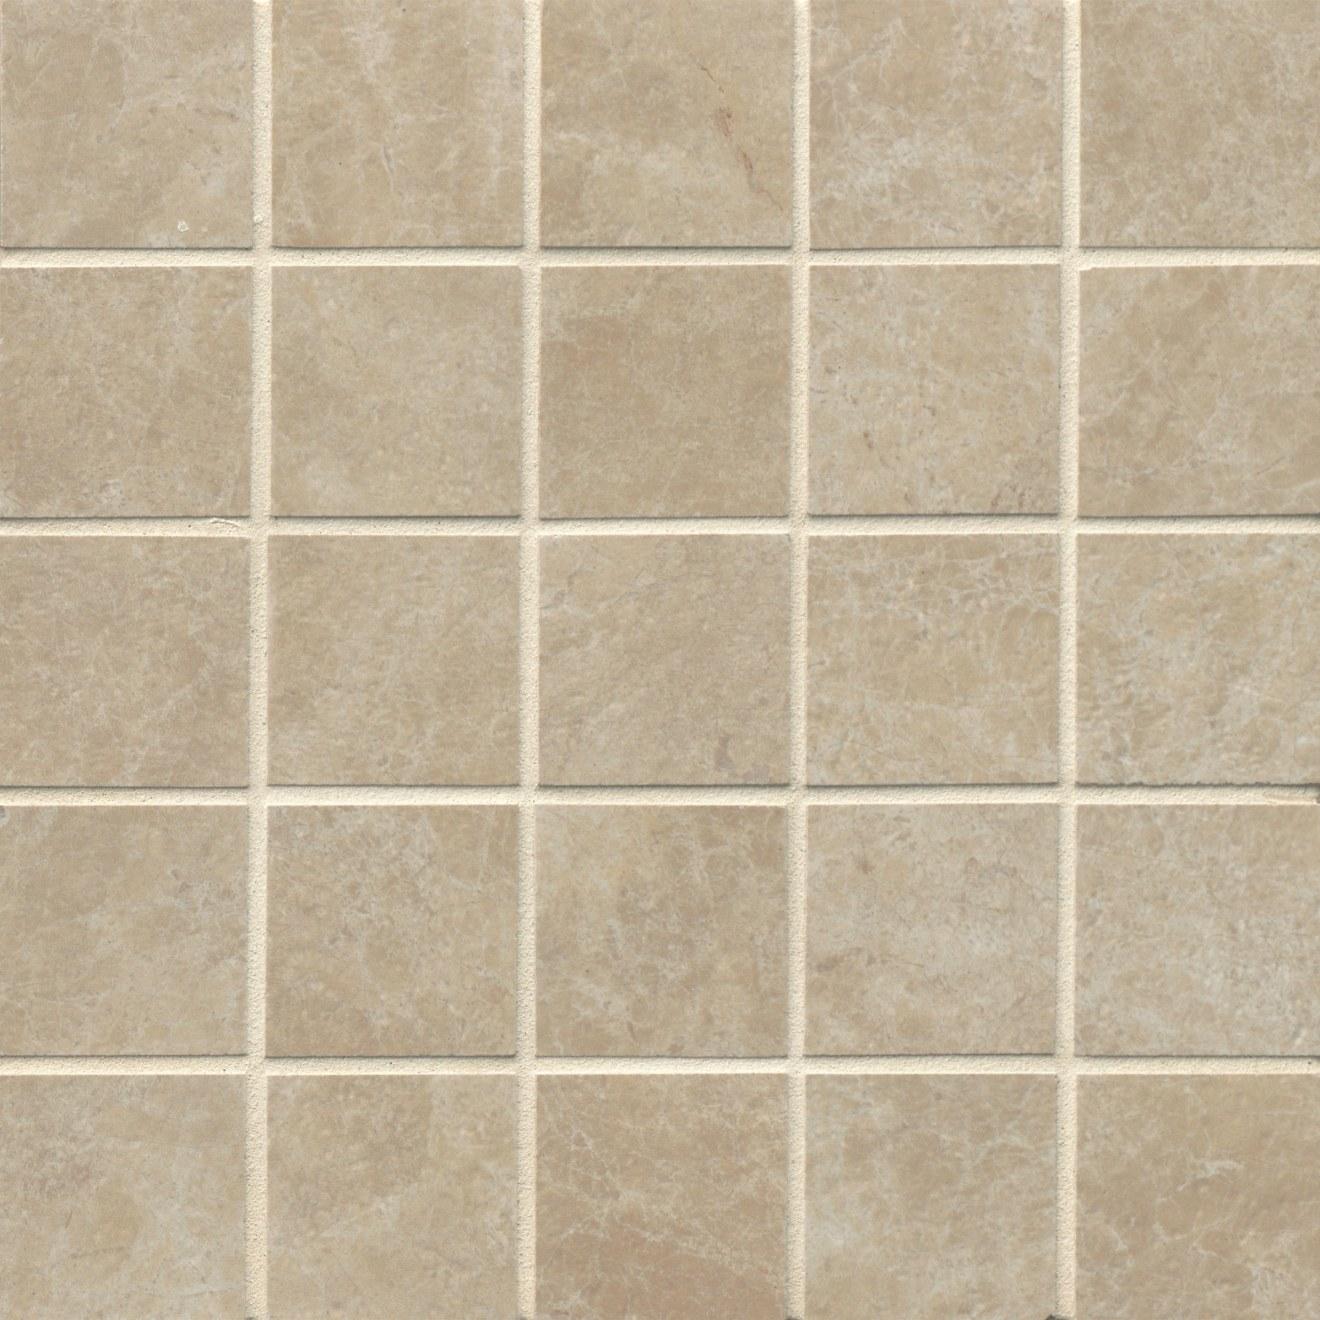 "Indiana Stone 2"" x 2"" Floor & Wall Mosaic in Beige"